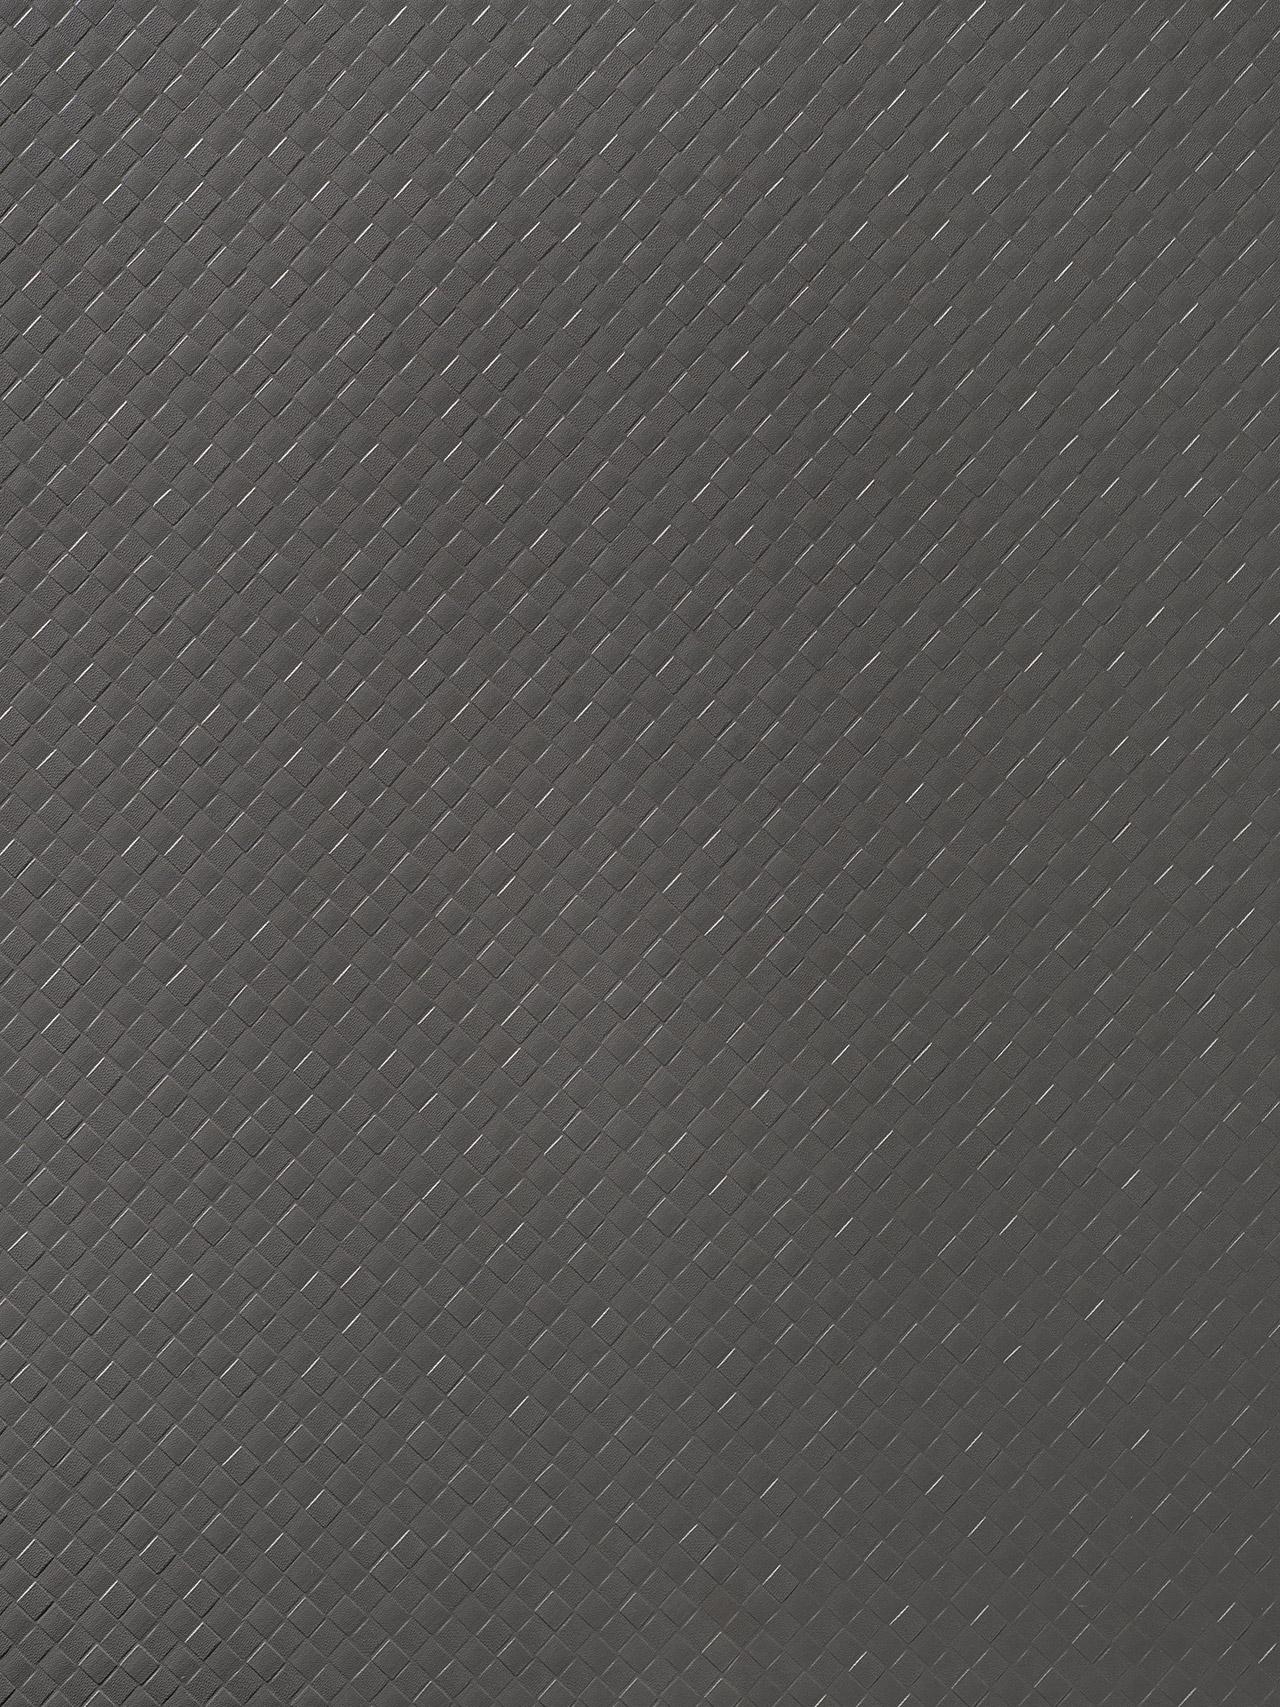 ДСП FB35 18мм Mosaico/Fiocco 2800х2070мм